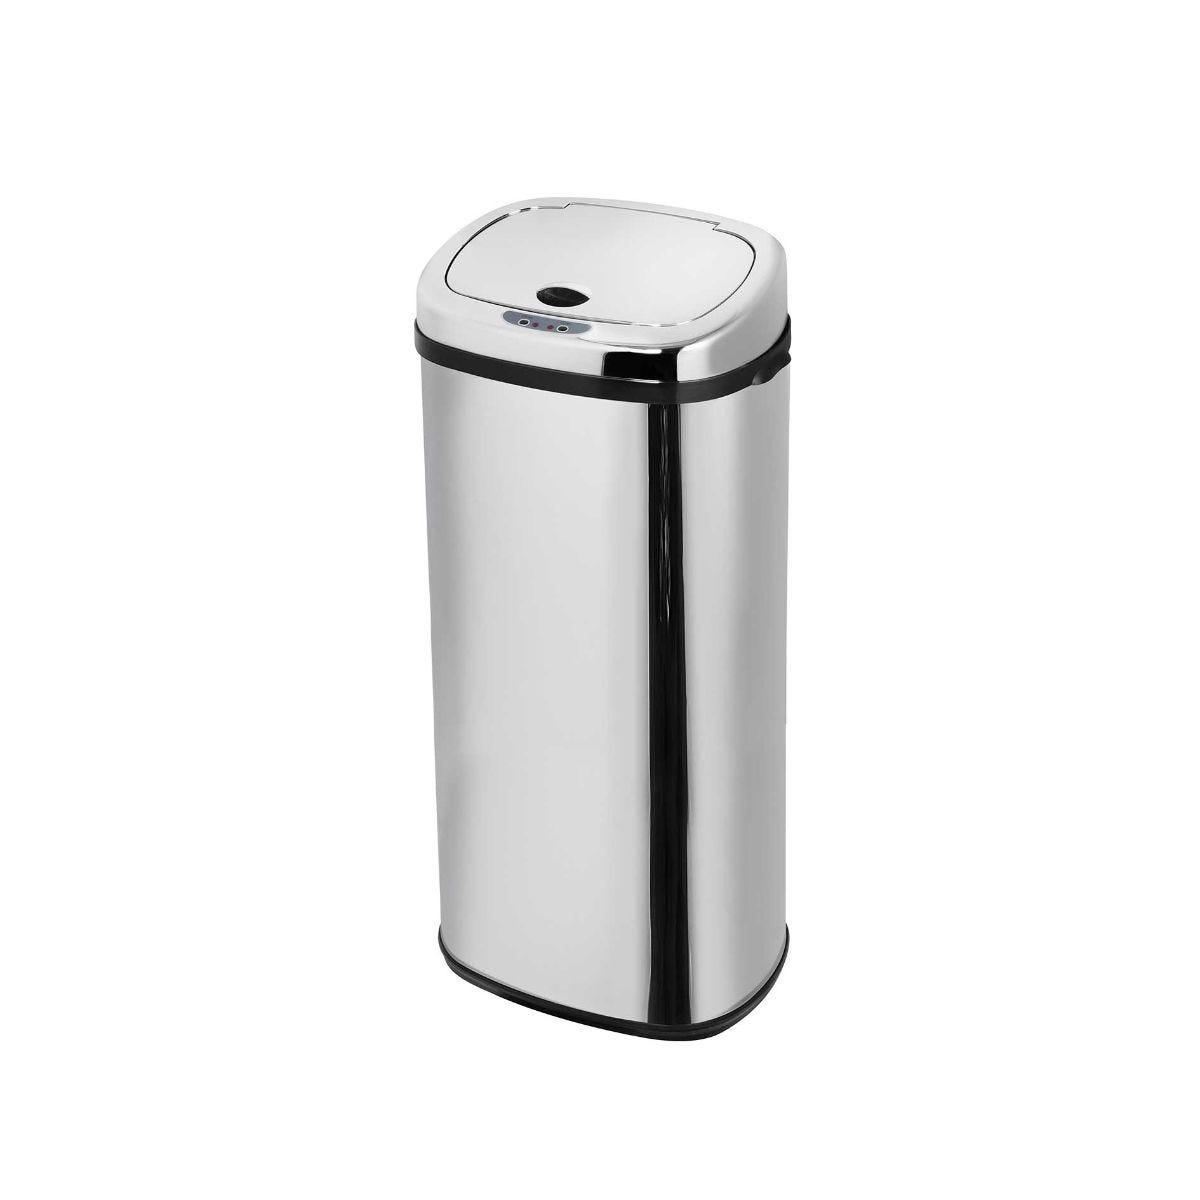 Morphy Richards Chroma Sensor Bin 50 Litre Square, Silver.